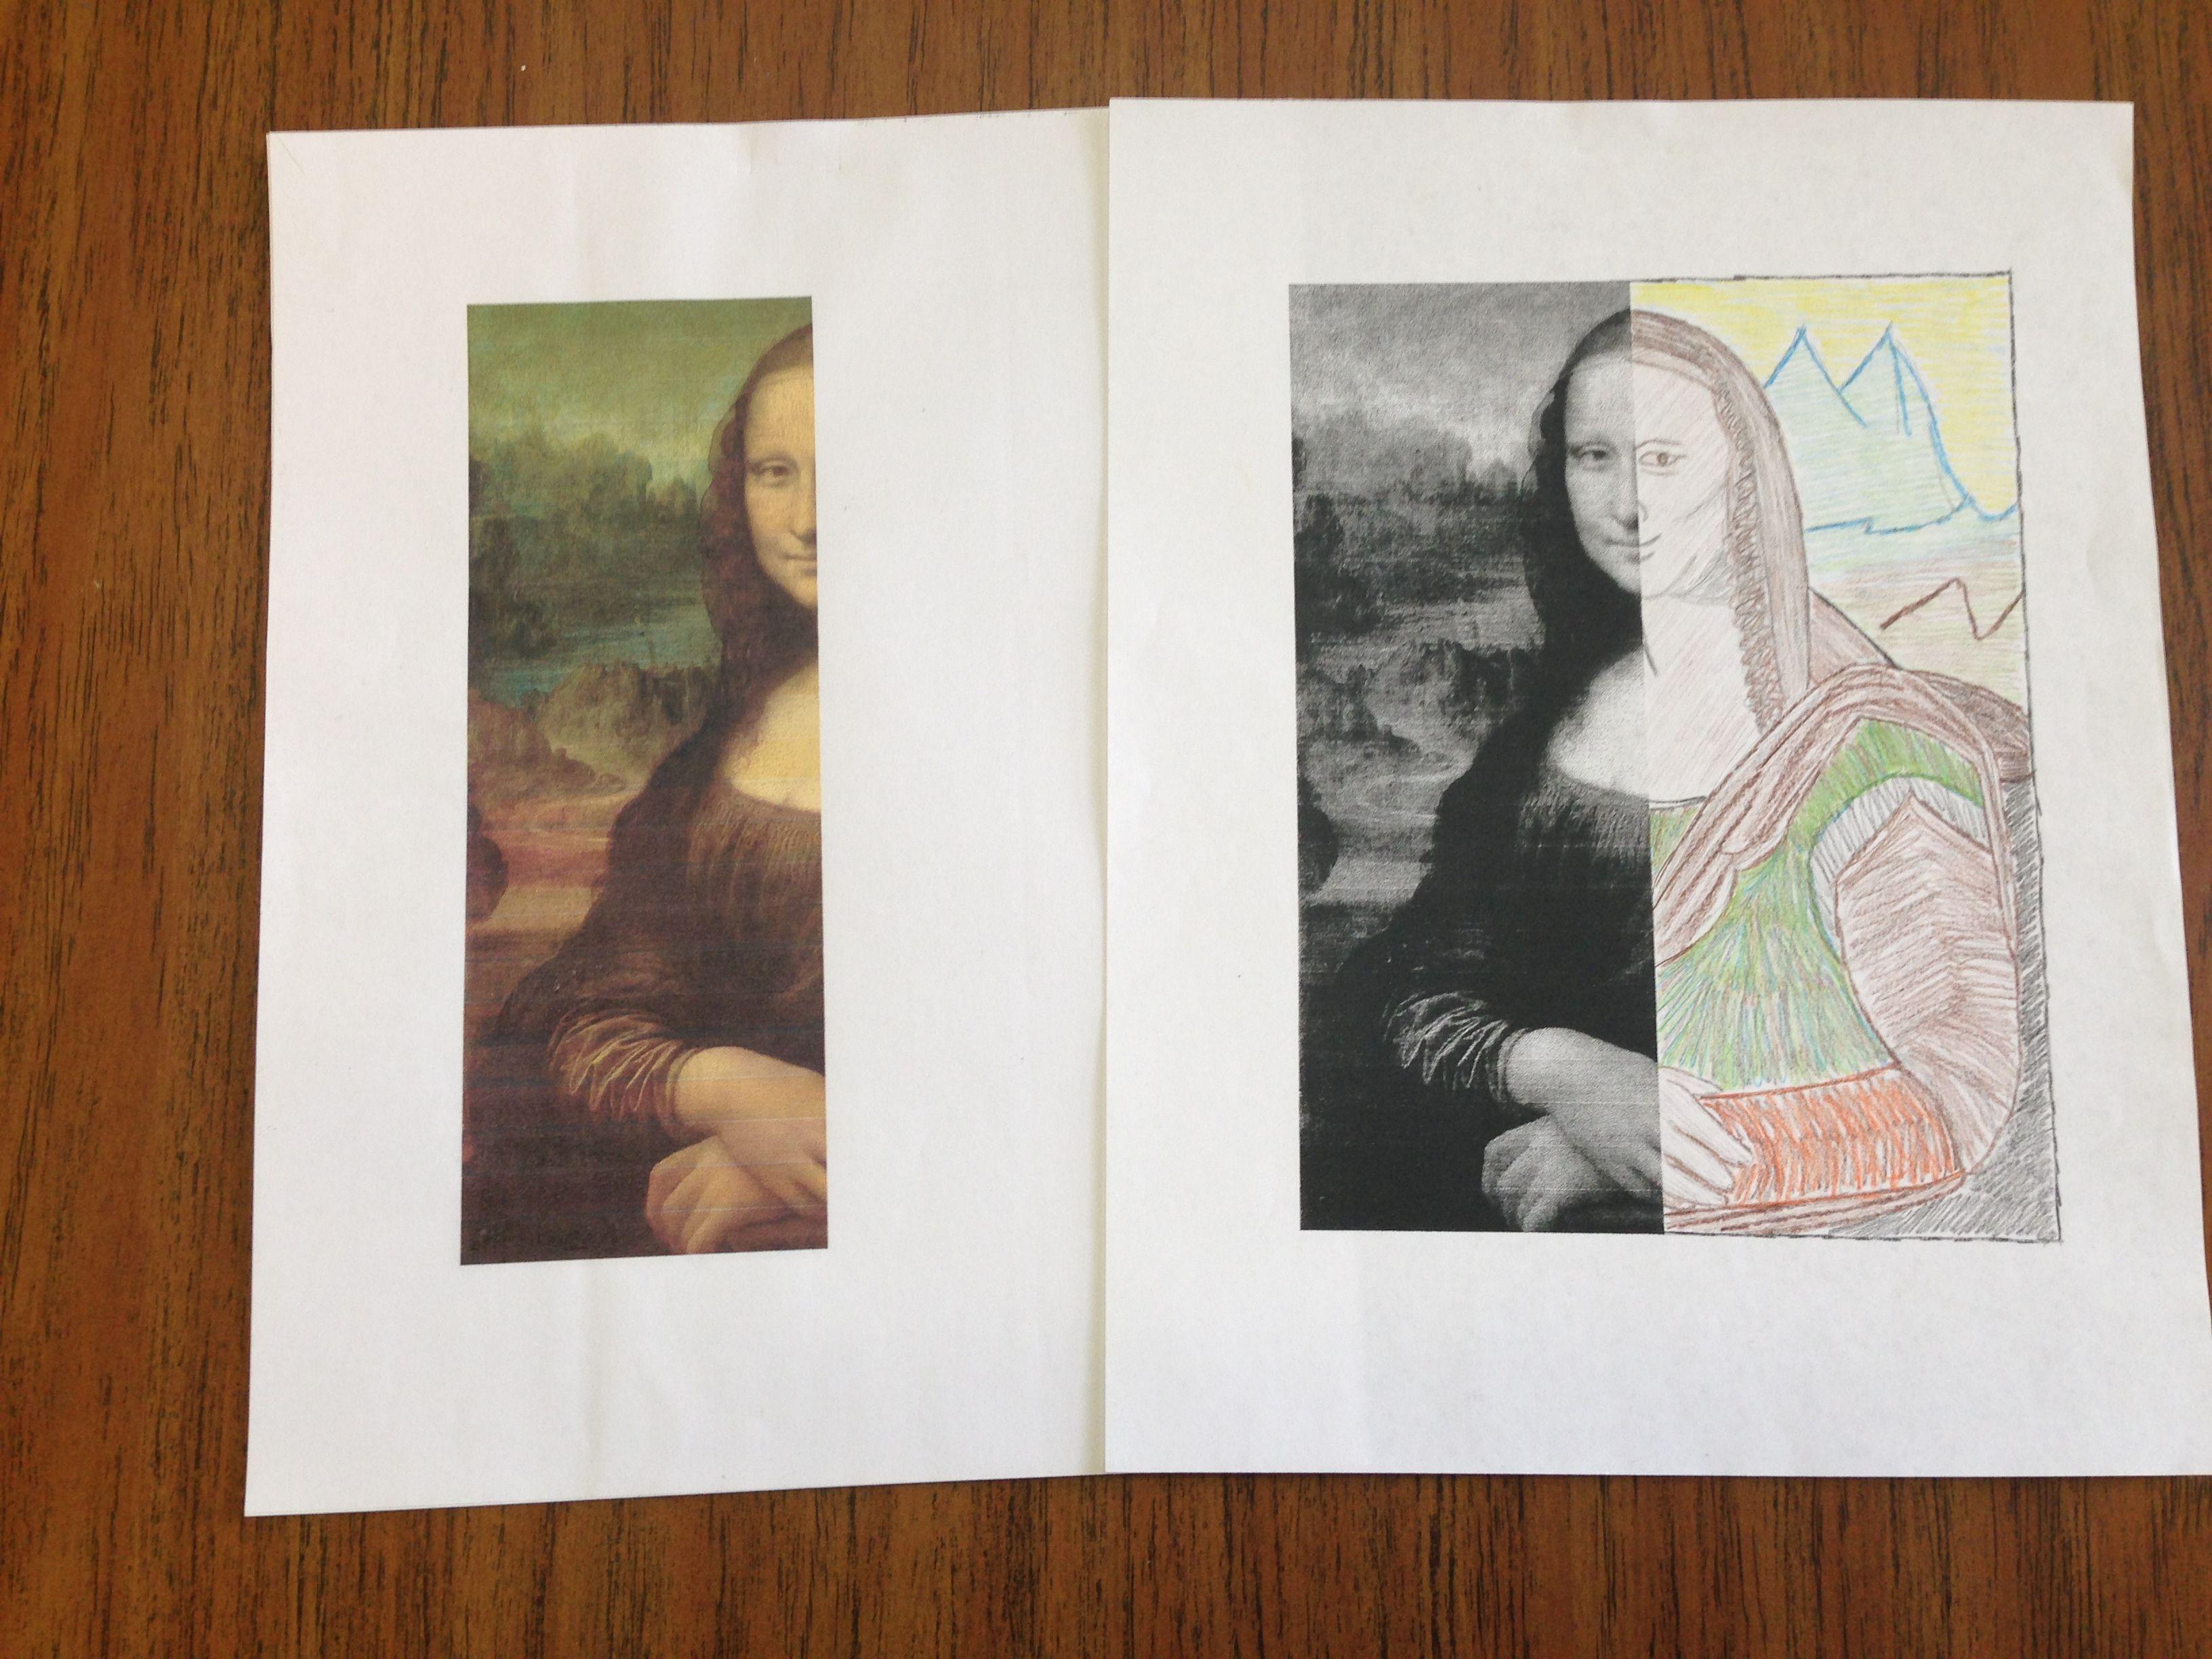 Middle School Art Lesson On Leonardo Da Vinci The Students Received Half Of Mona Lisa And Had